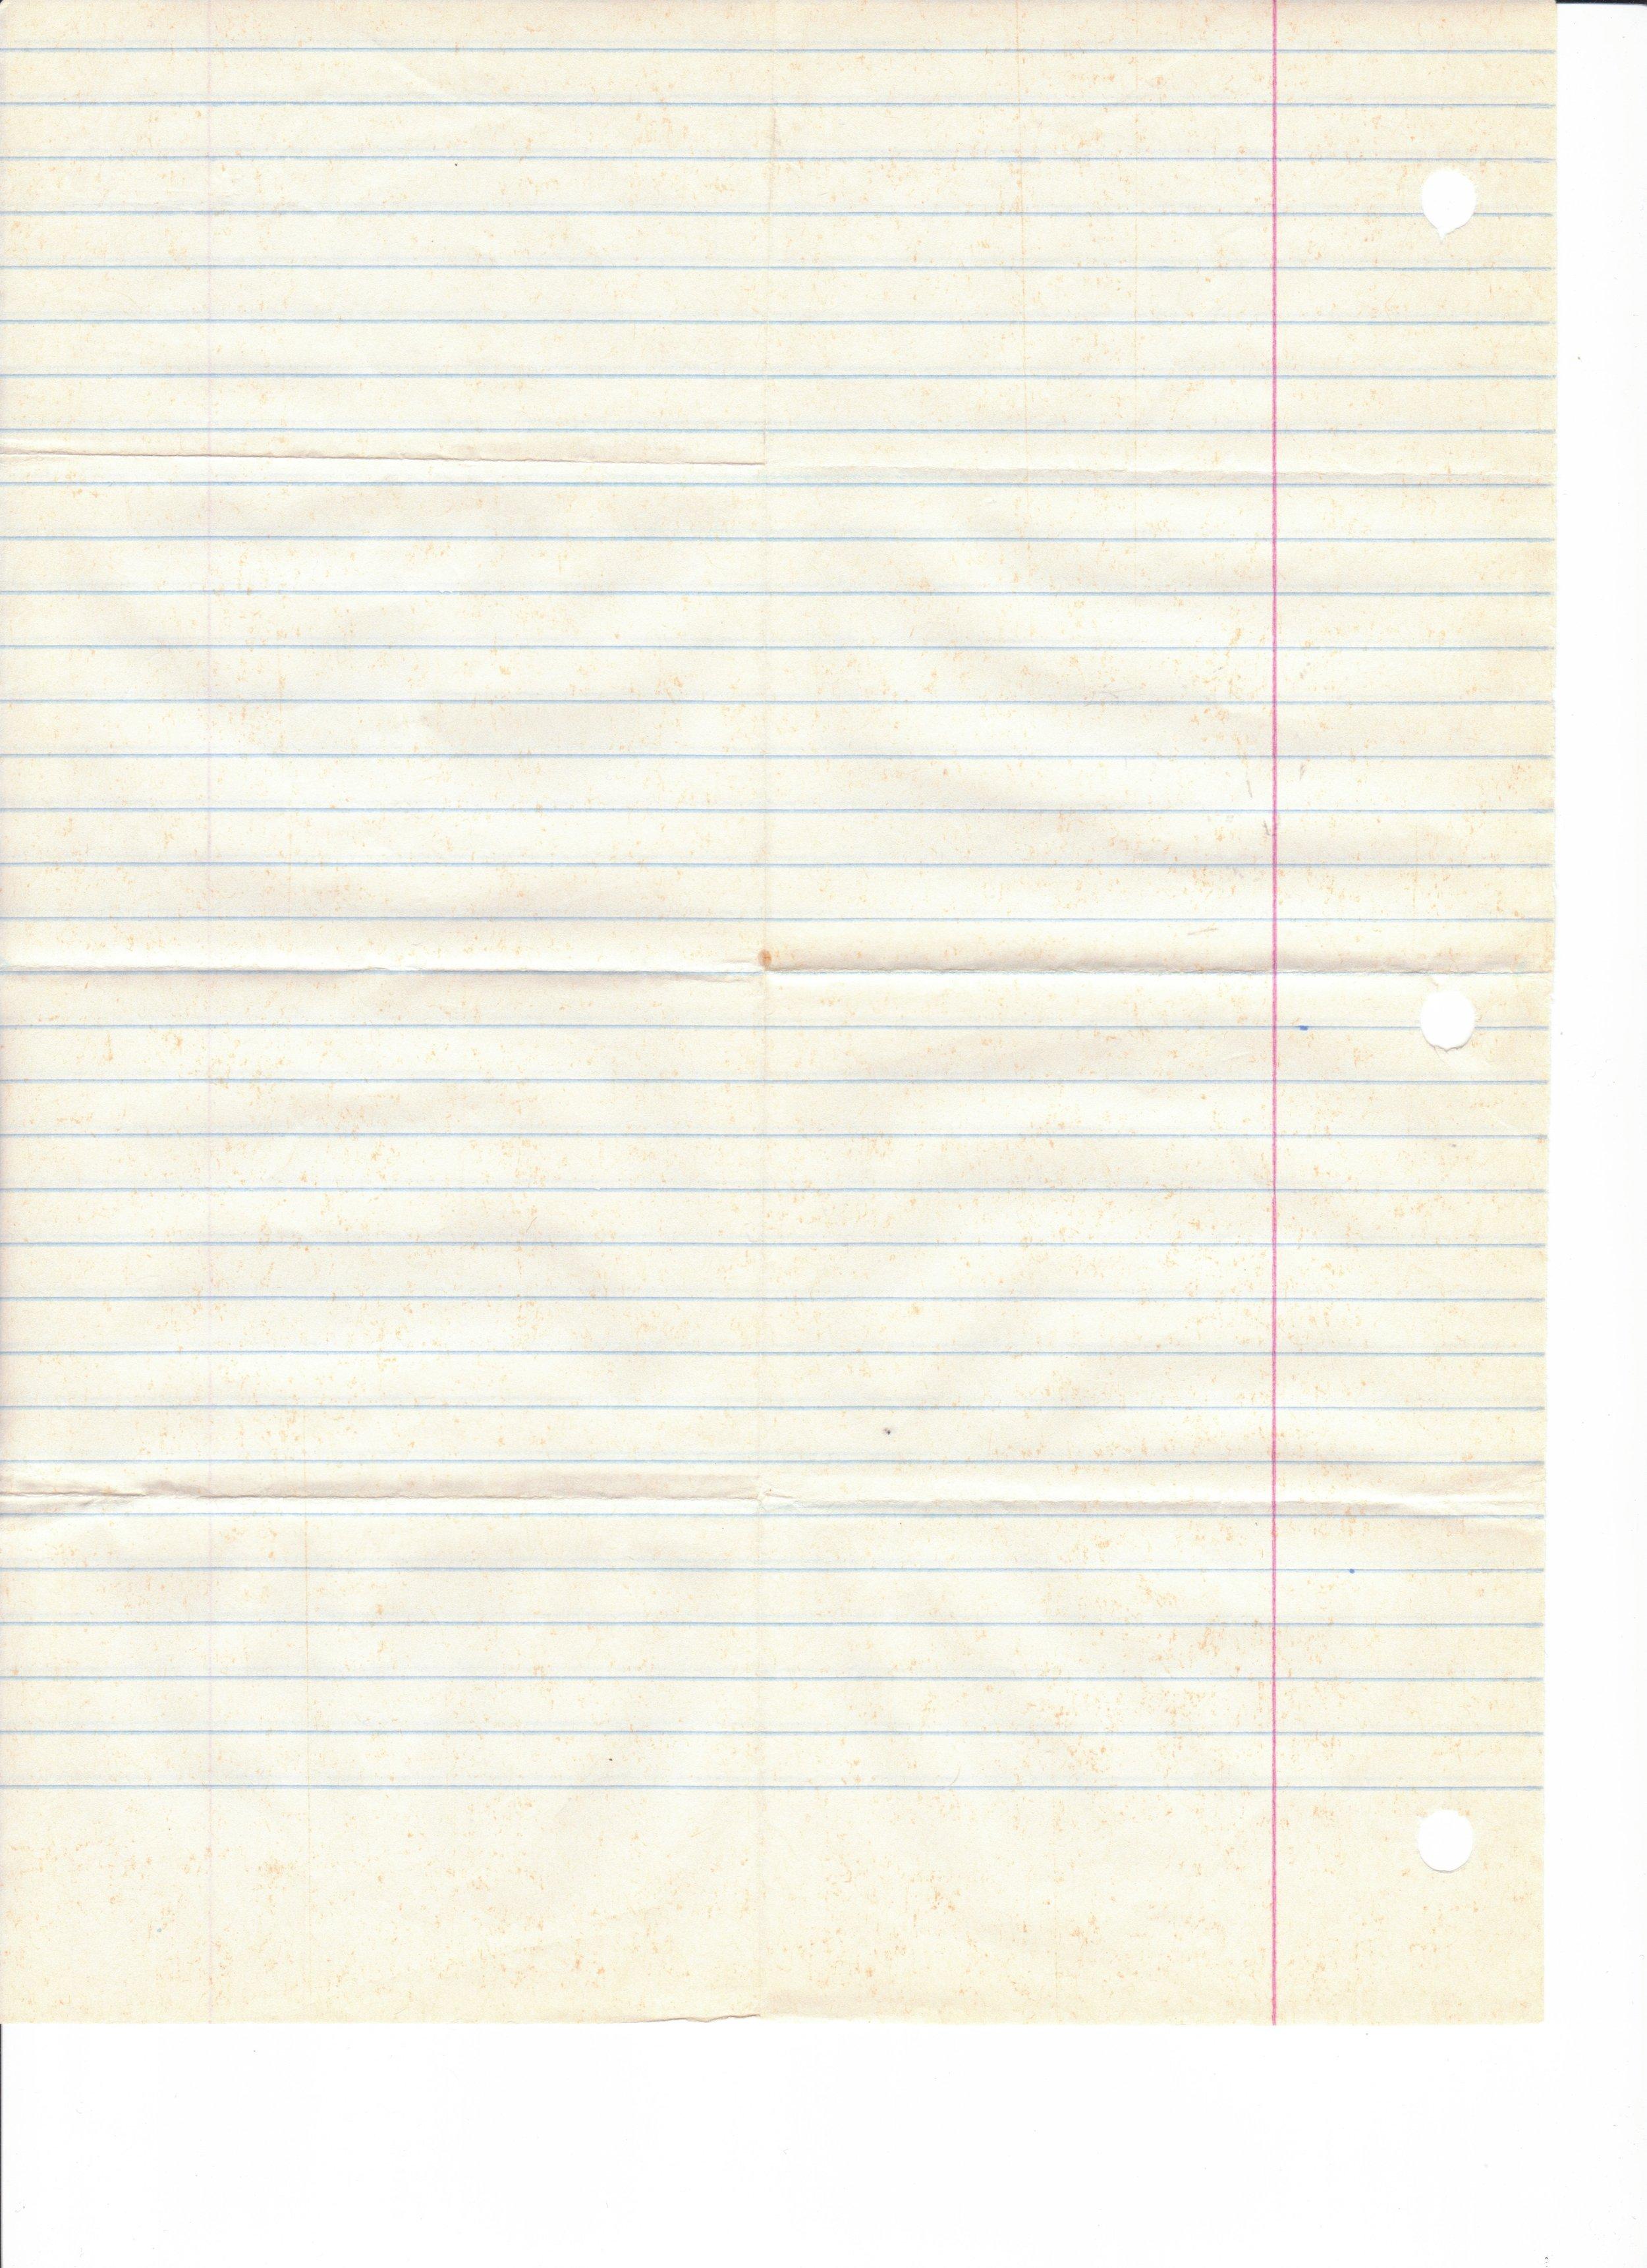 notebook5-v2_Page_117.jpg